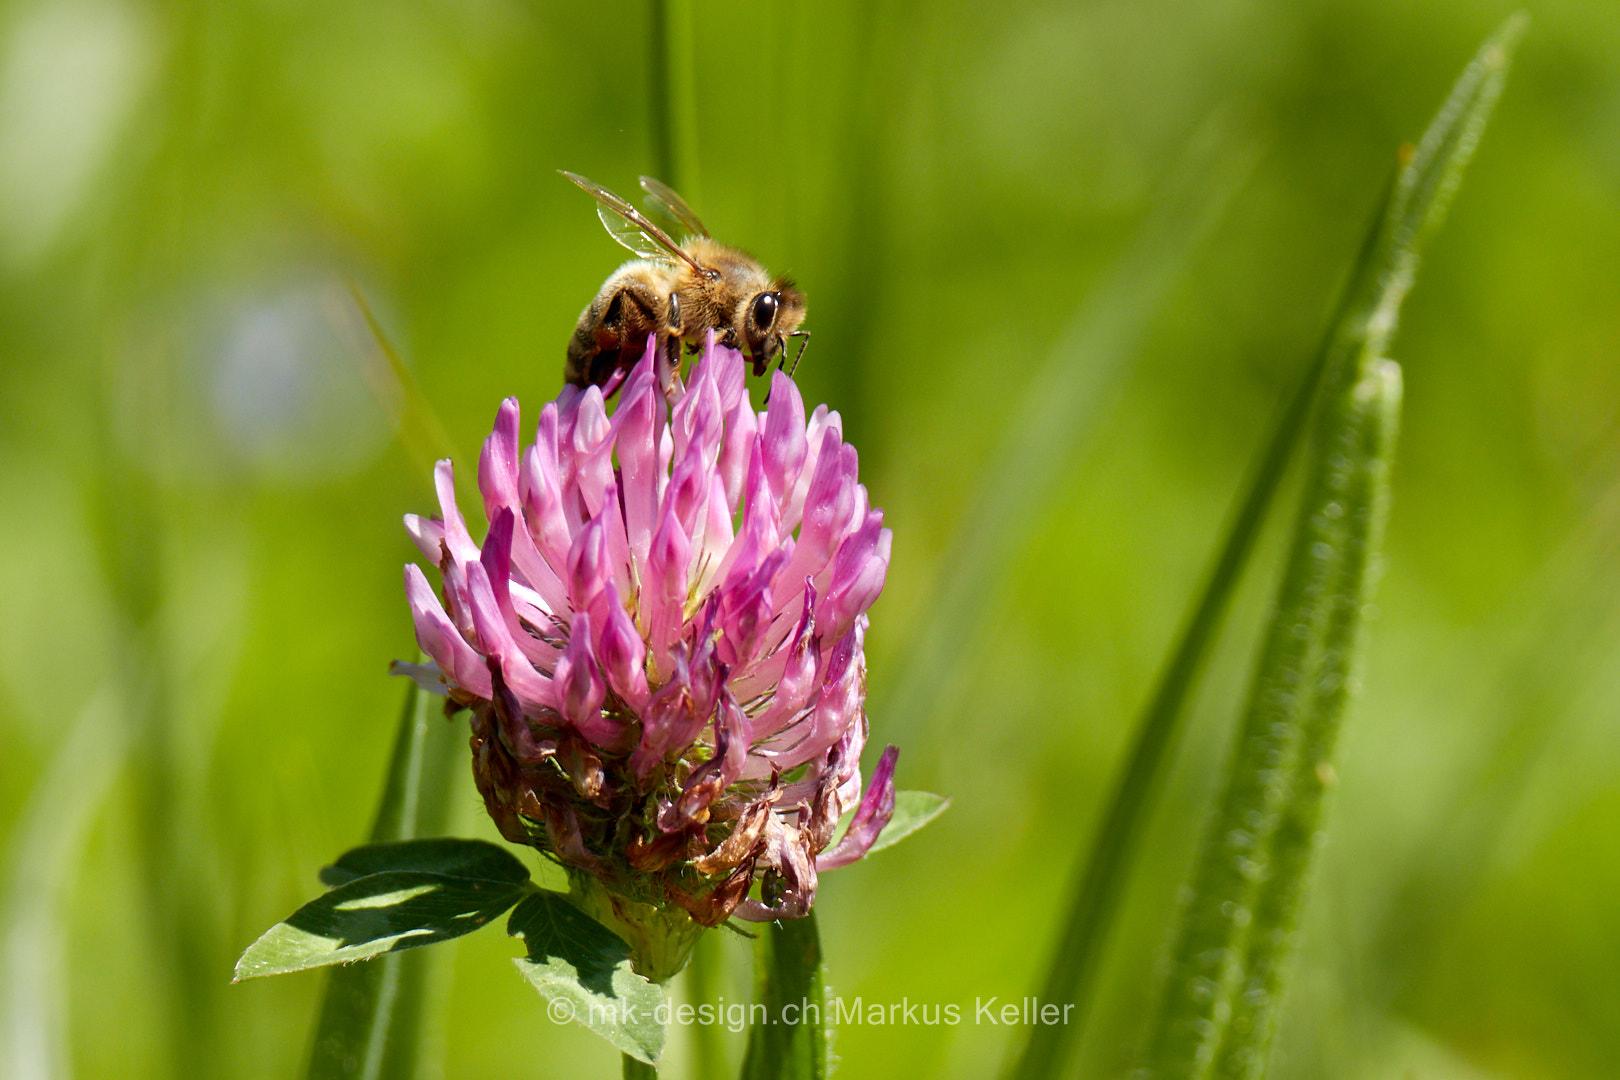 Tier   Insekte   Biene   Pflanze   Klee